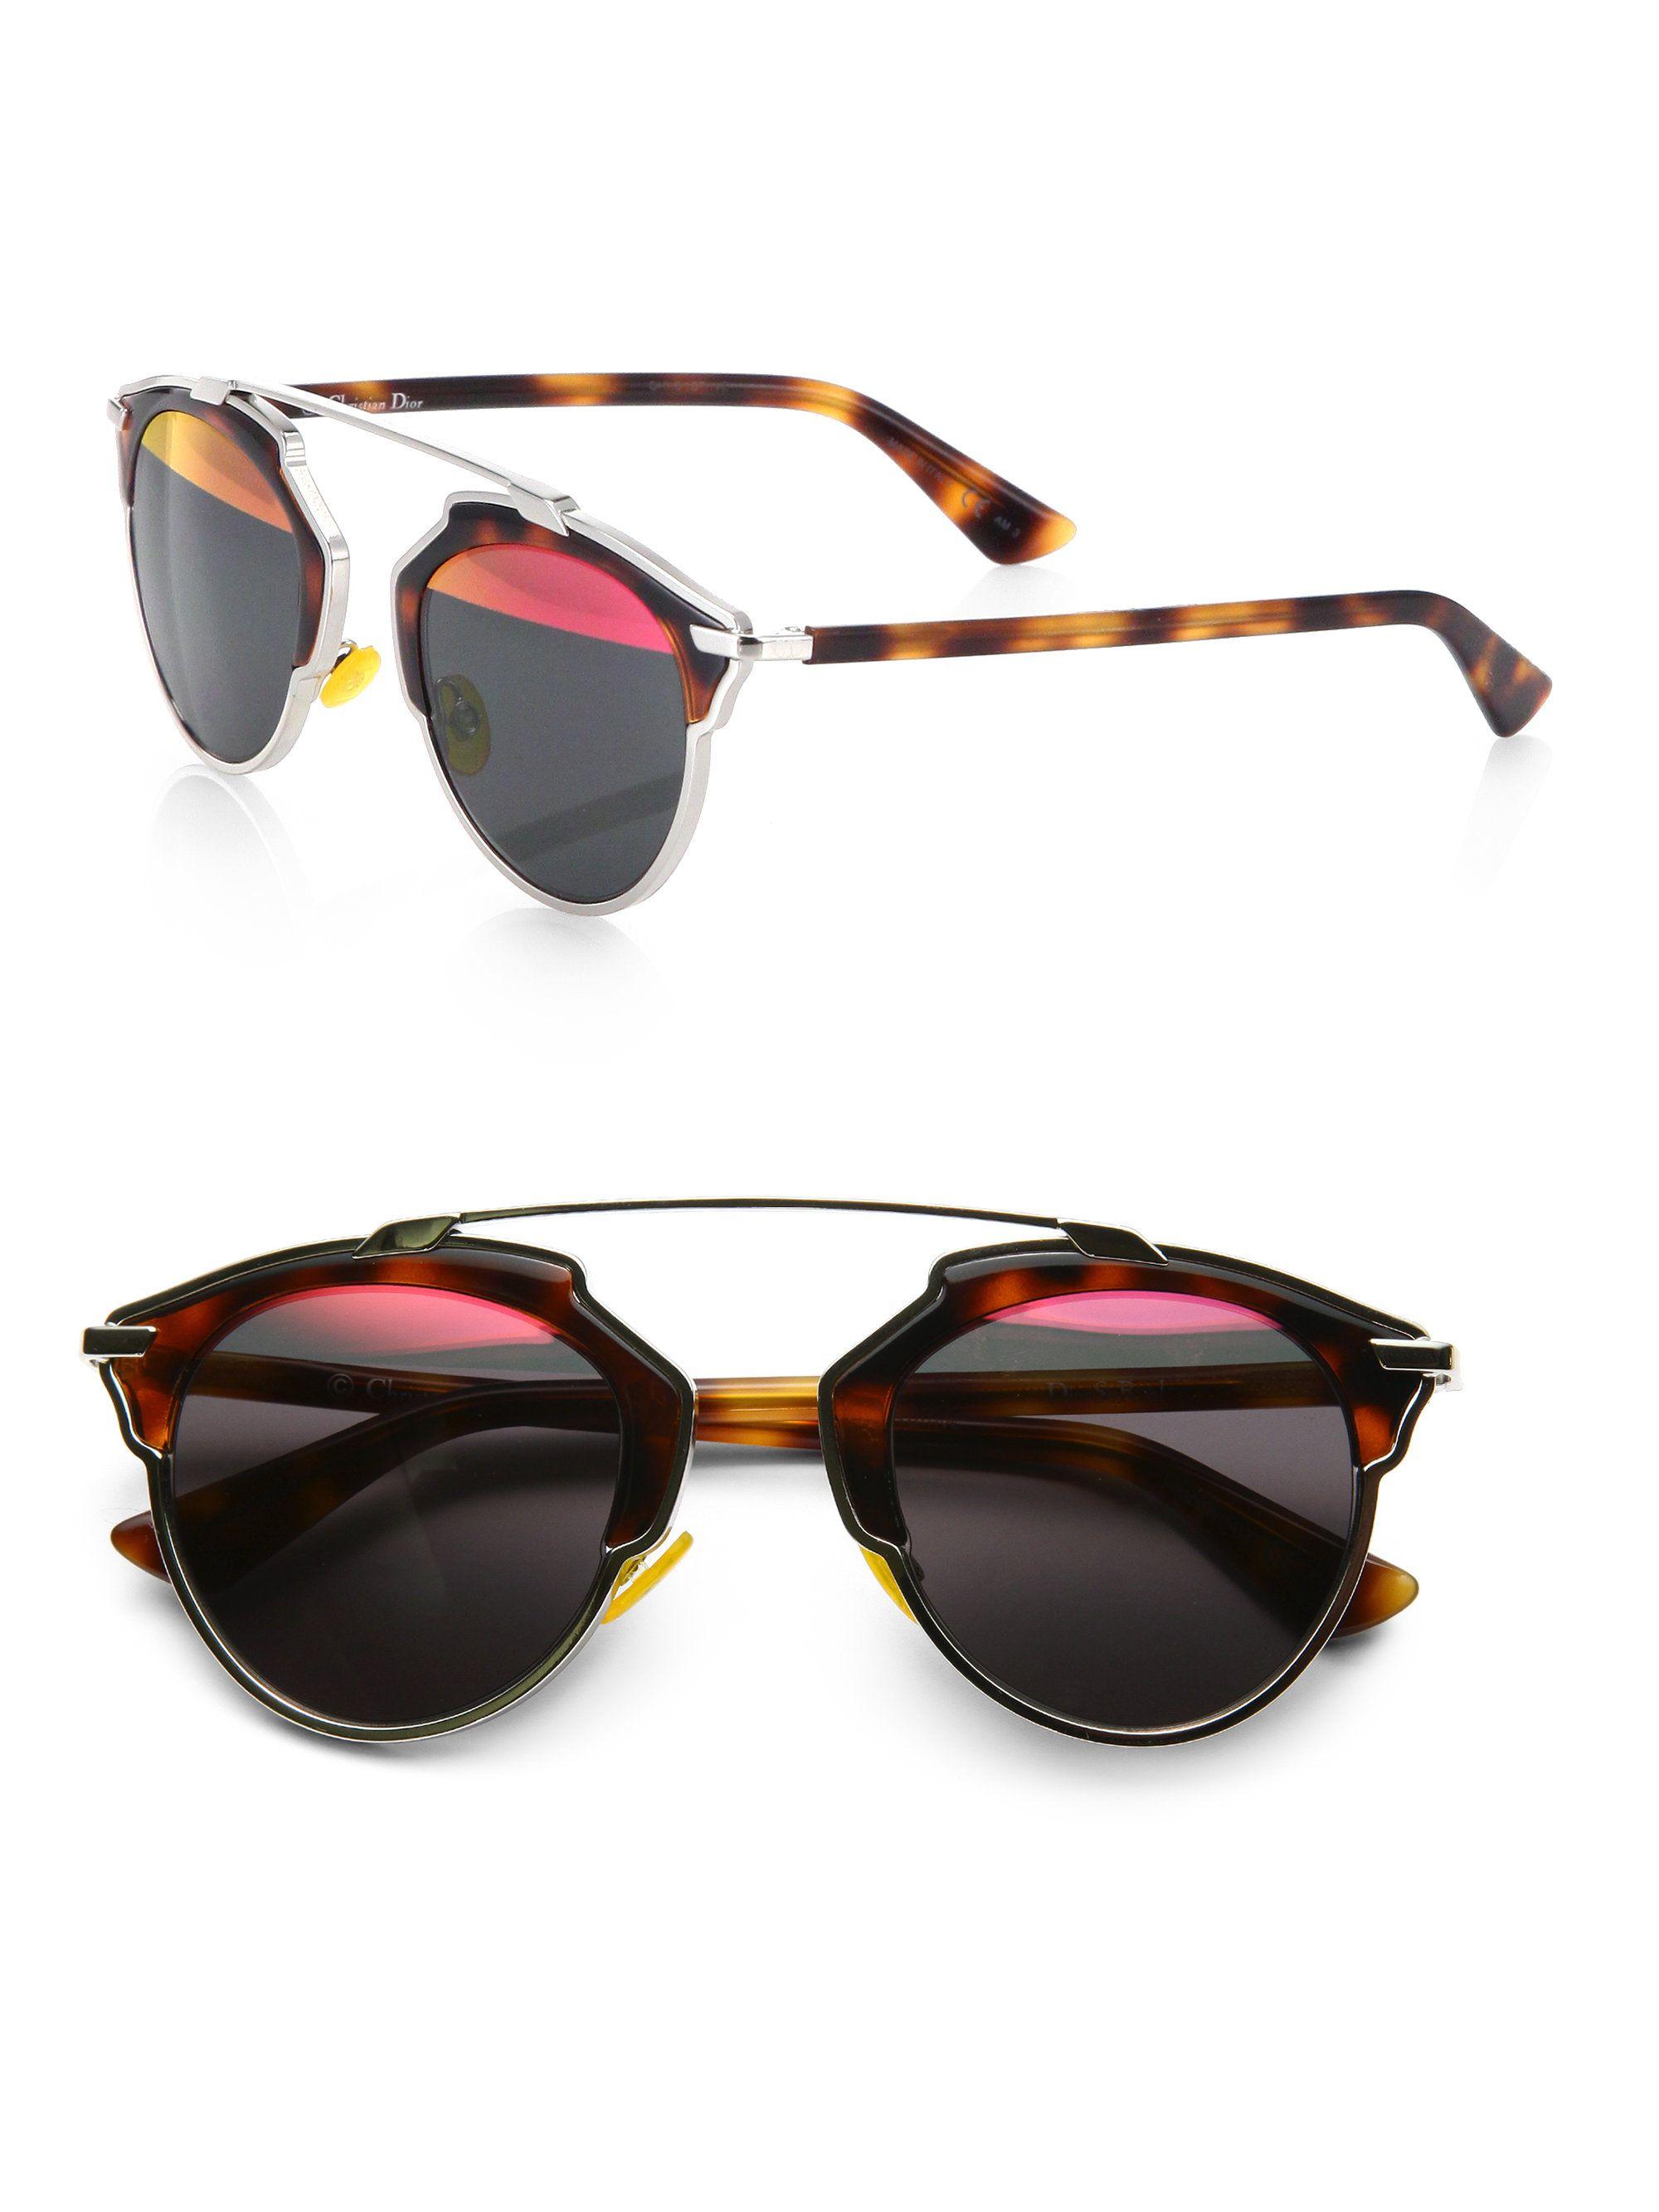 b11ad5e1d854c Ray-Ban Unisex RB2140 Original Wayfarer Sunglasses